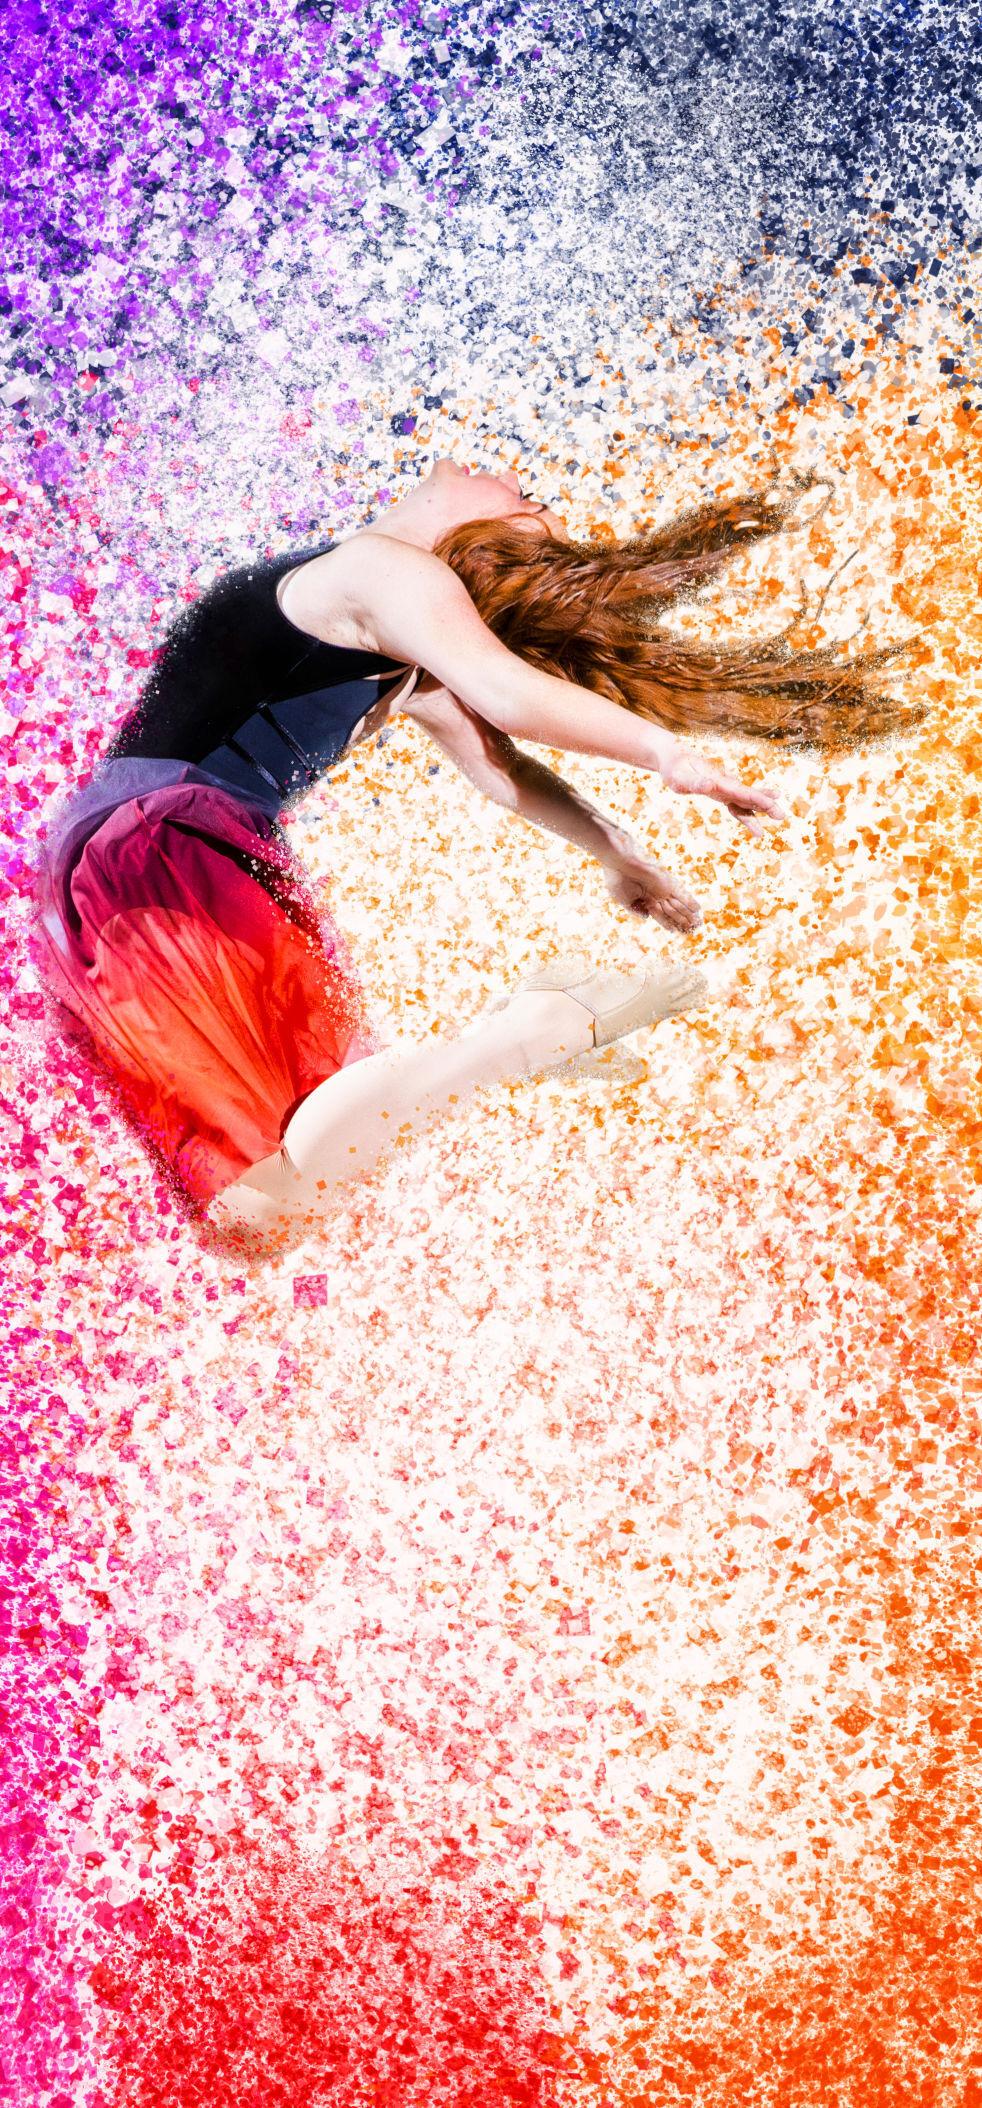 Jaeli Garrard, dancer of the year